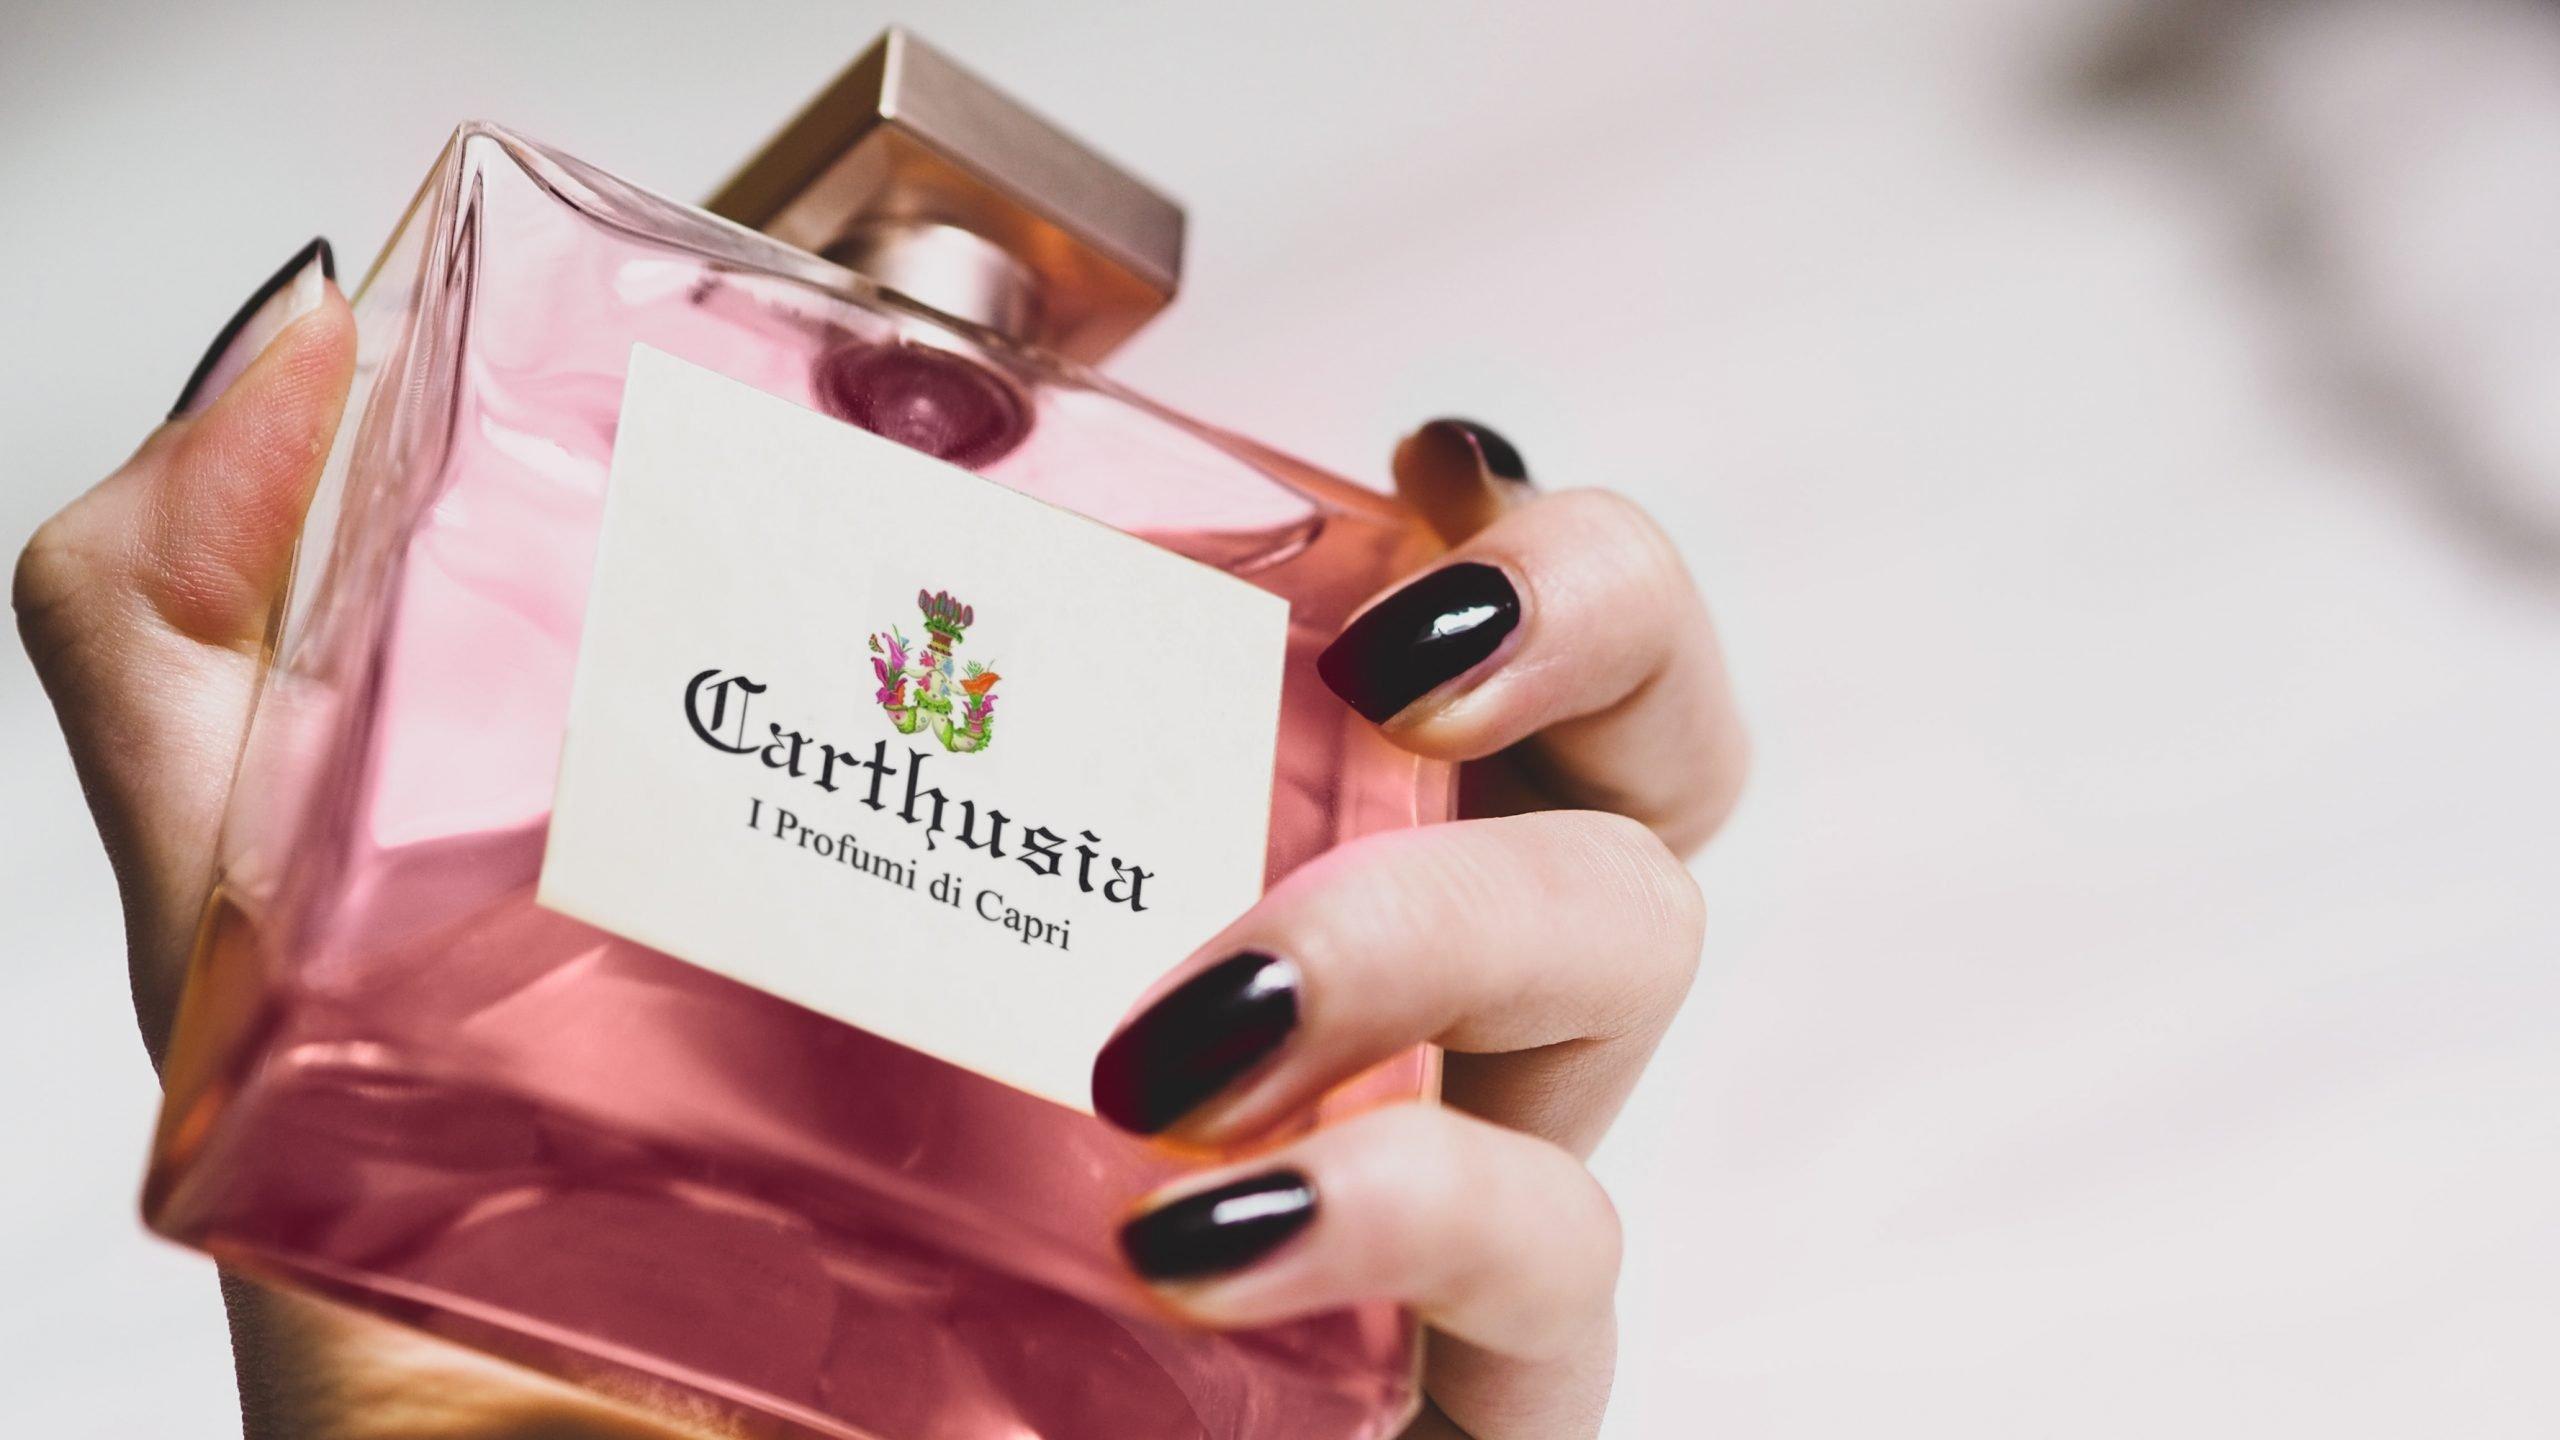 Free Perfume Bottle Mockup Design